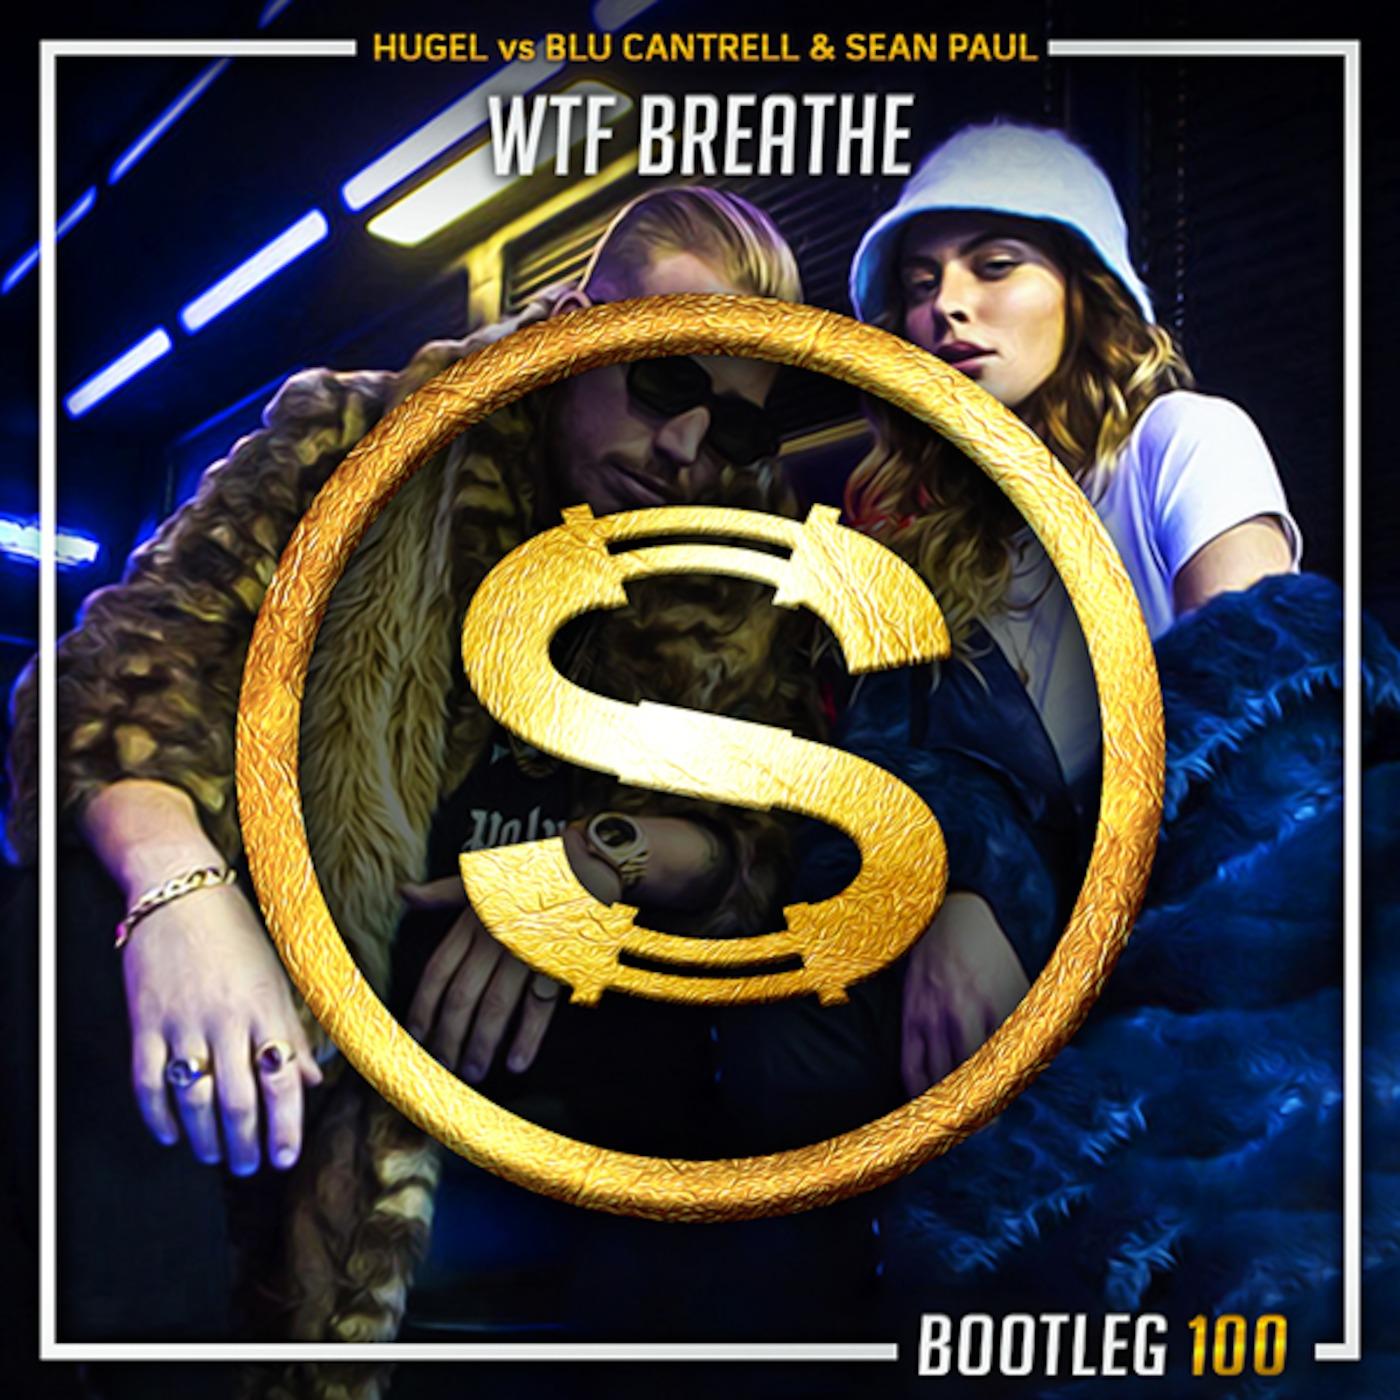 Hugel vs Blu Cantrell x Sean Paul - Wtf Breathe (Da Sylva bootleg)